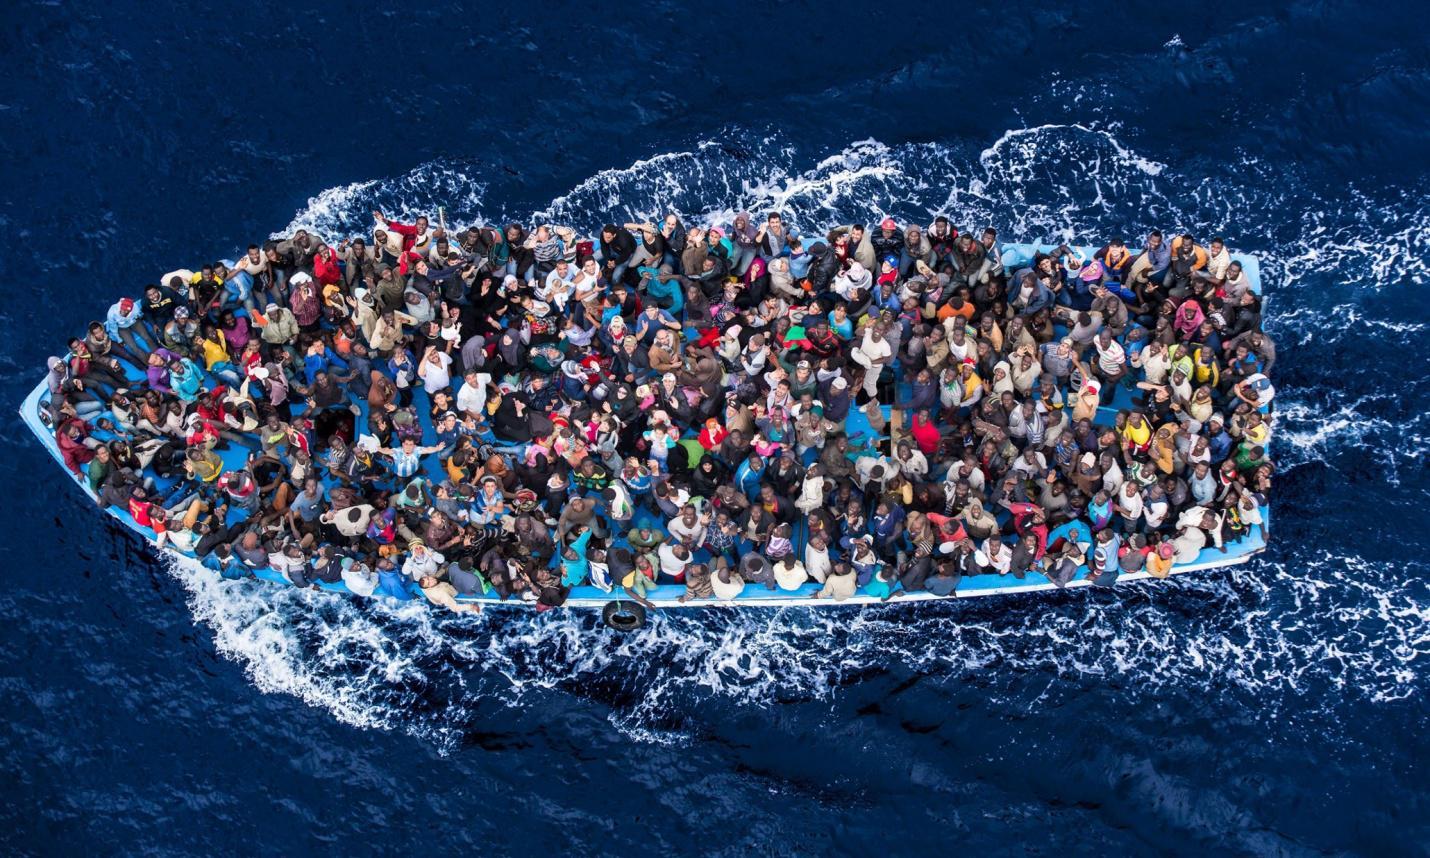 Resultado de imaxes para Refujiados